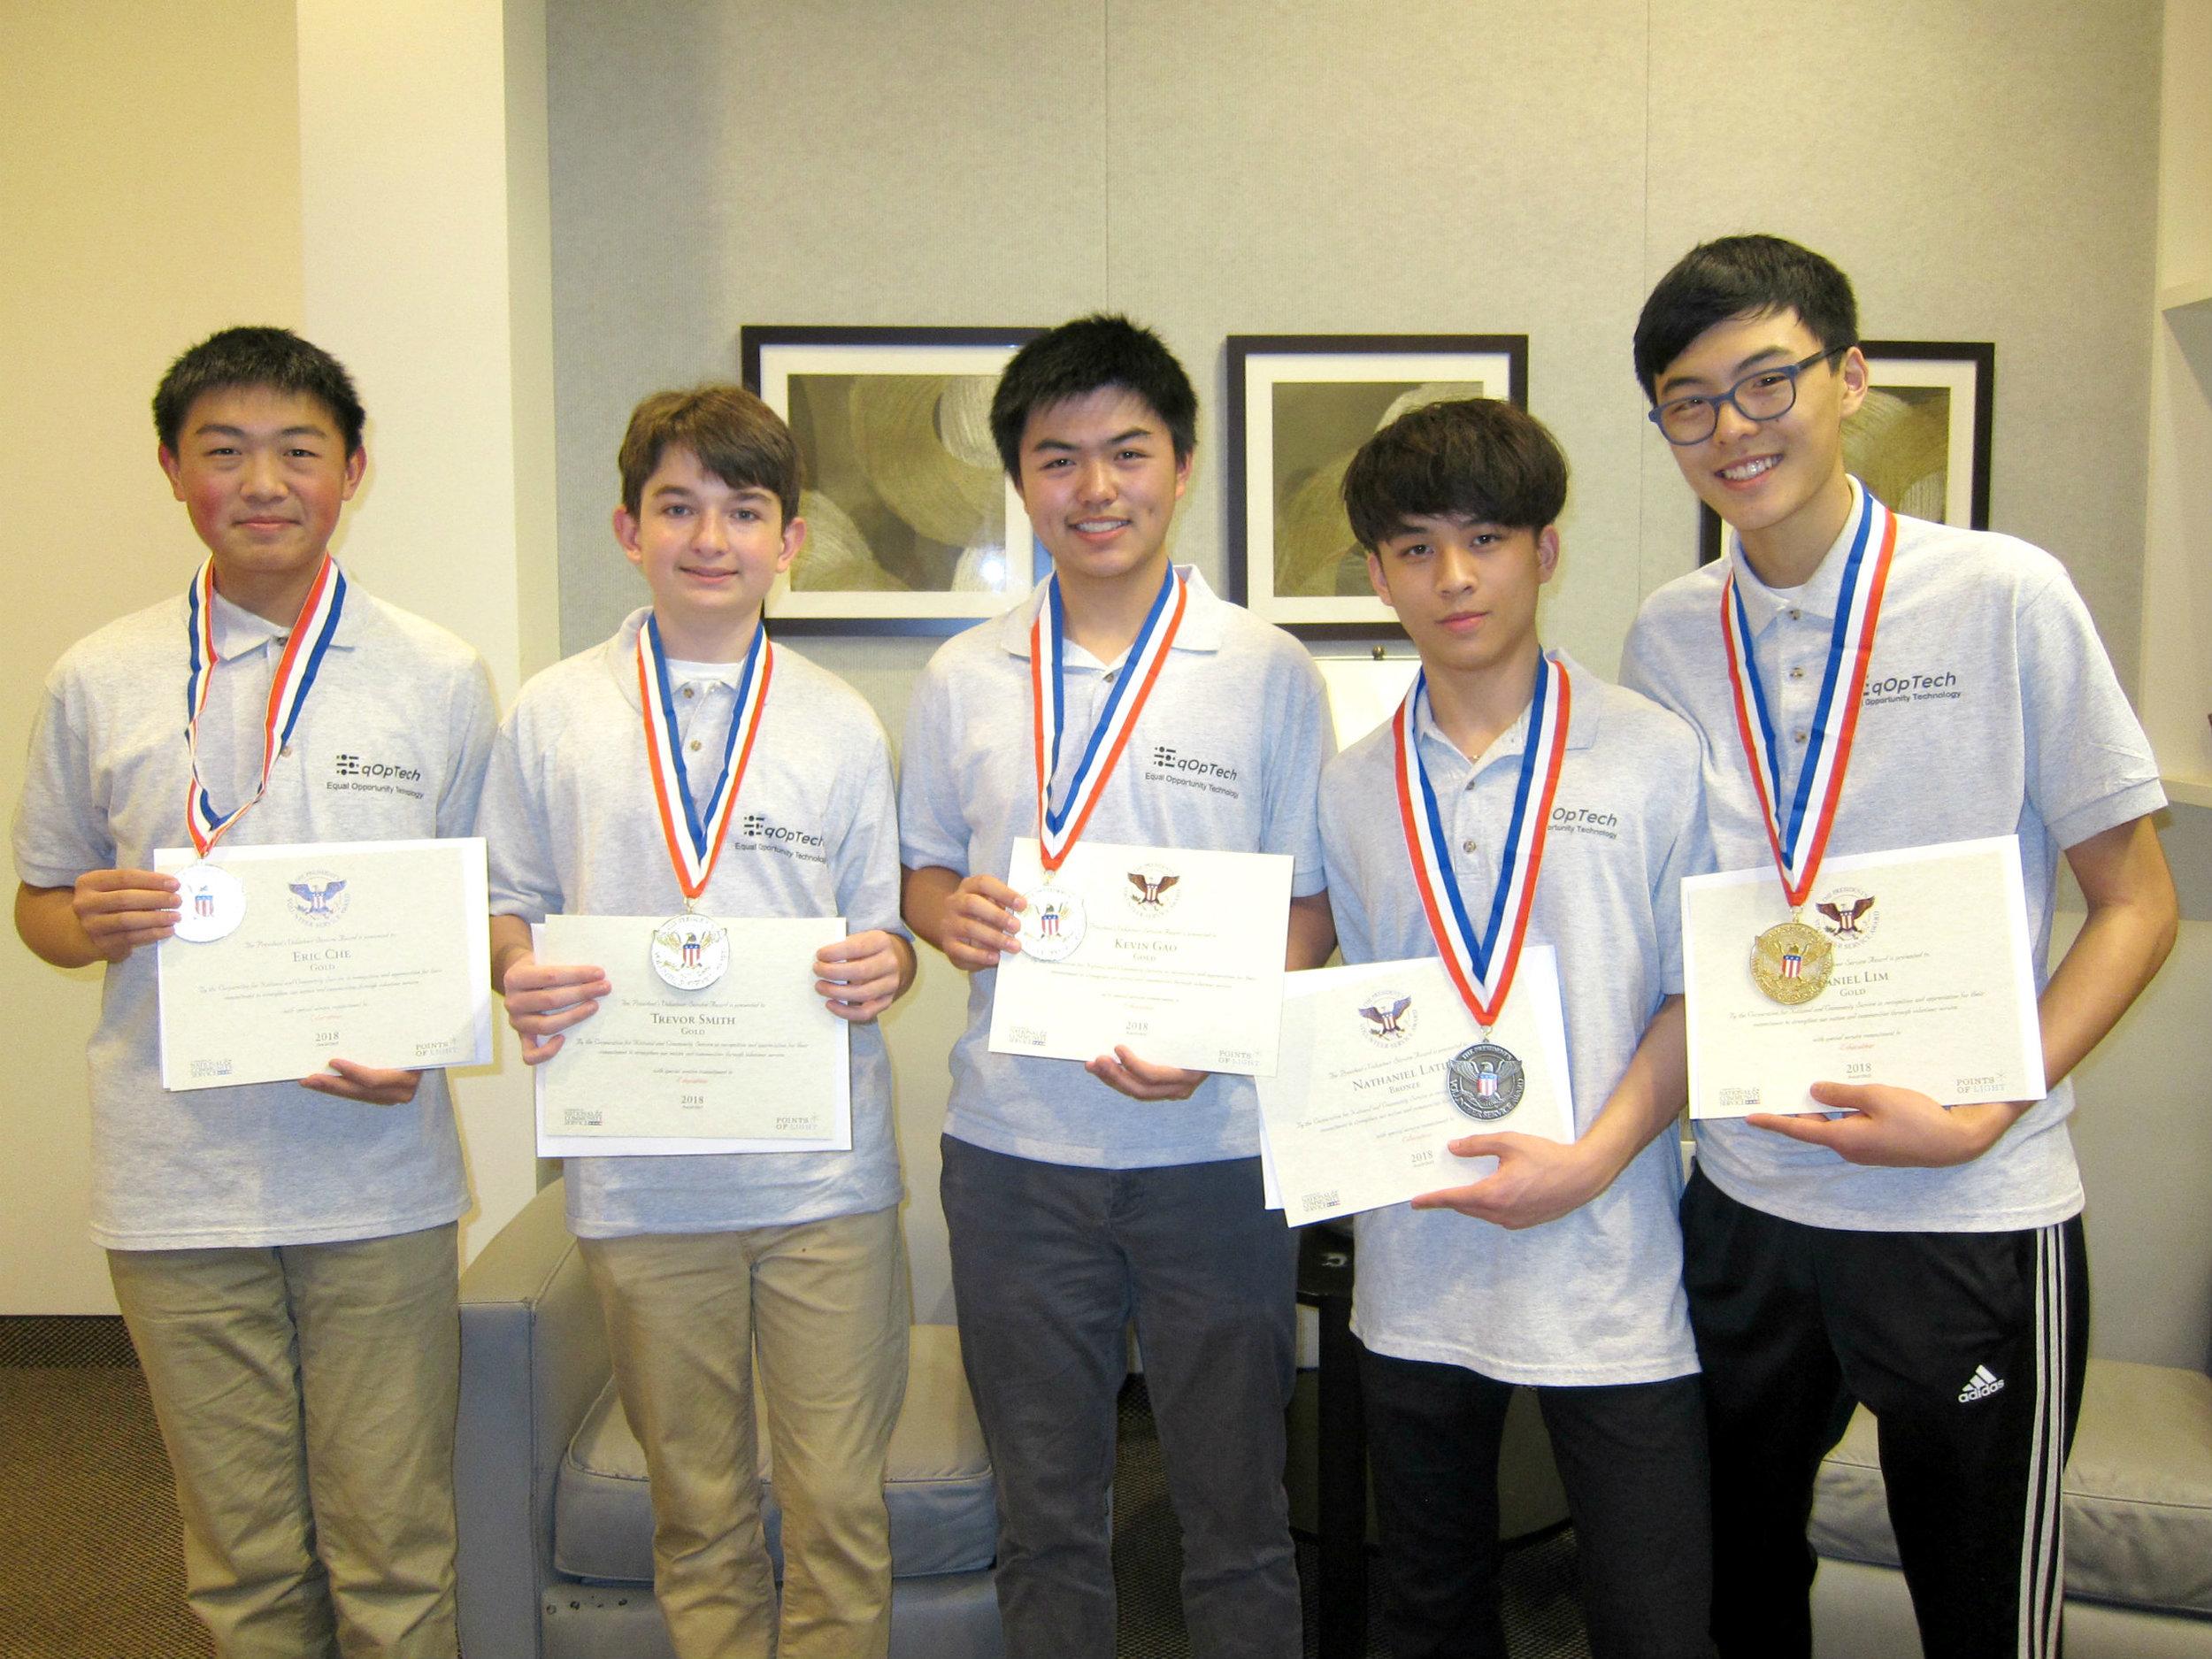 2018 PVSA Medalists - EqOpTech Inc.